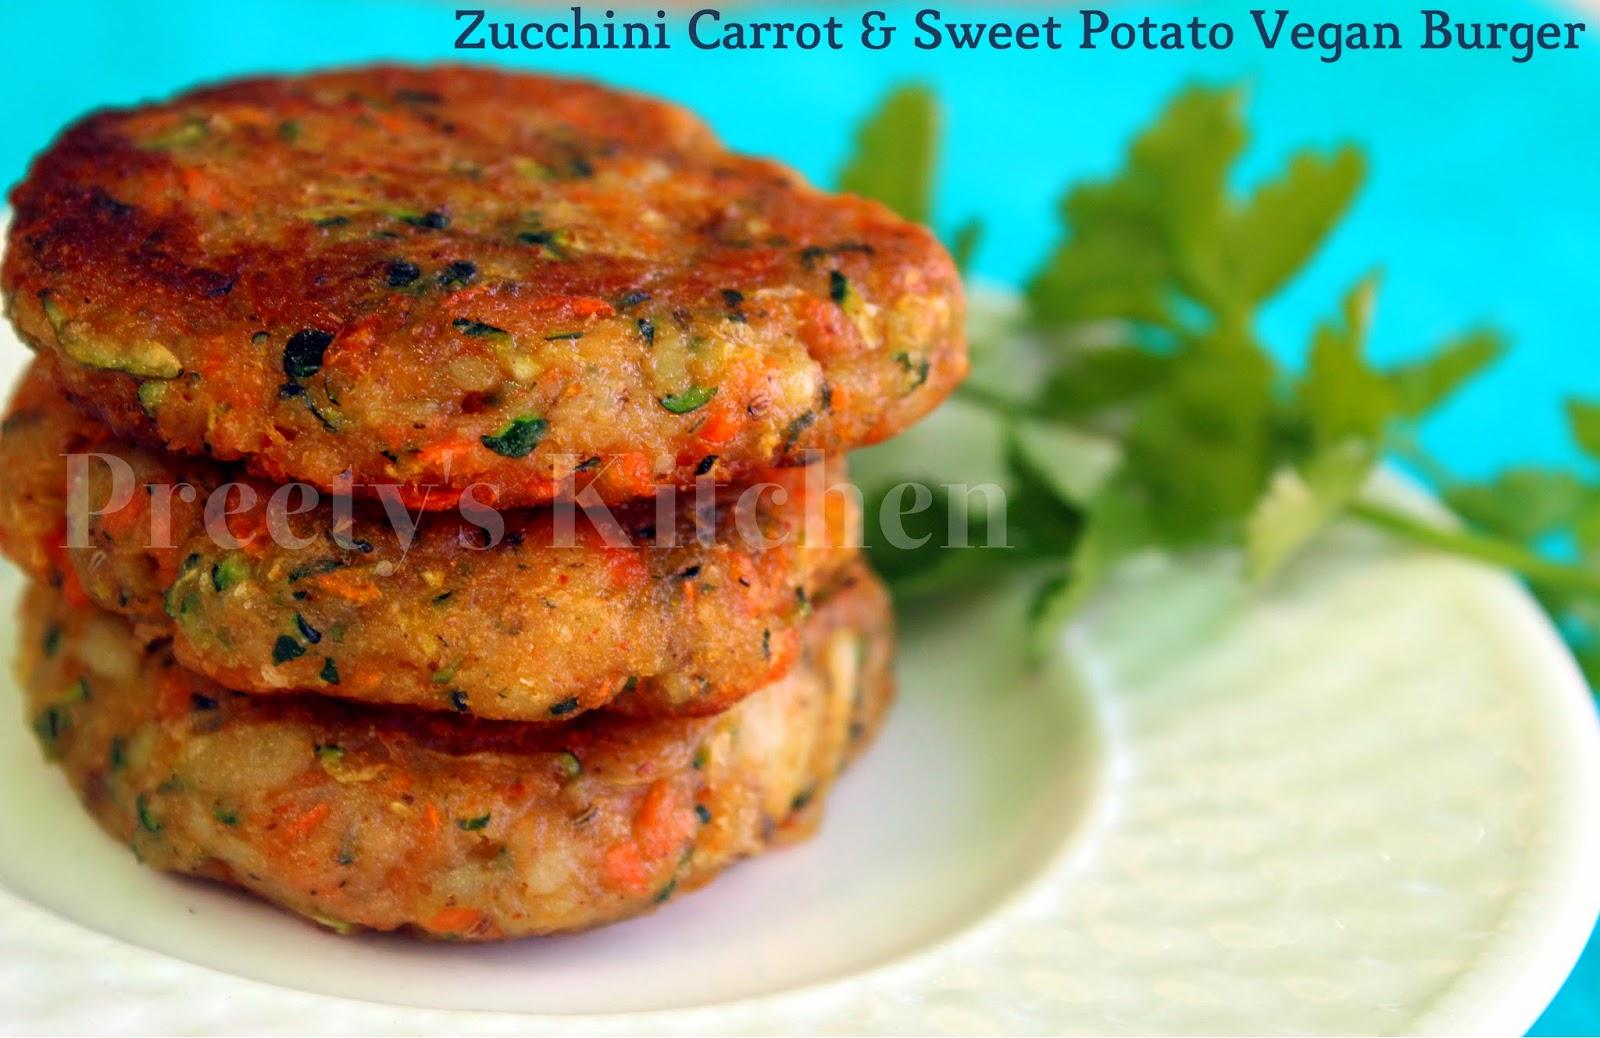 Preetys kitchen zucchini carrot sweet potato vegan burger zucchini carrot sweet potato vegan burger patty tikki forumfinder Choice Image